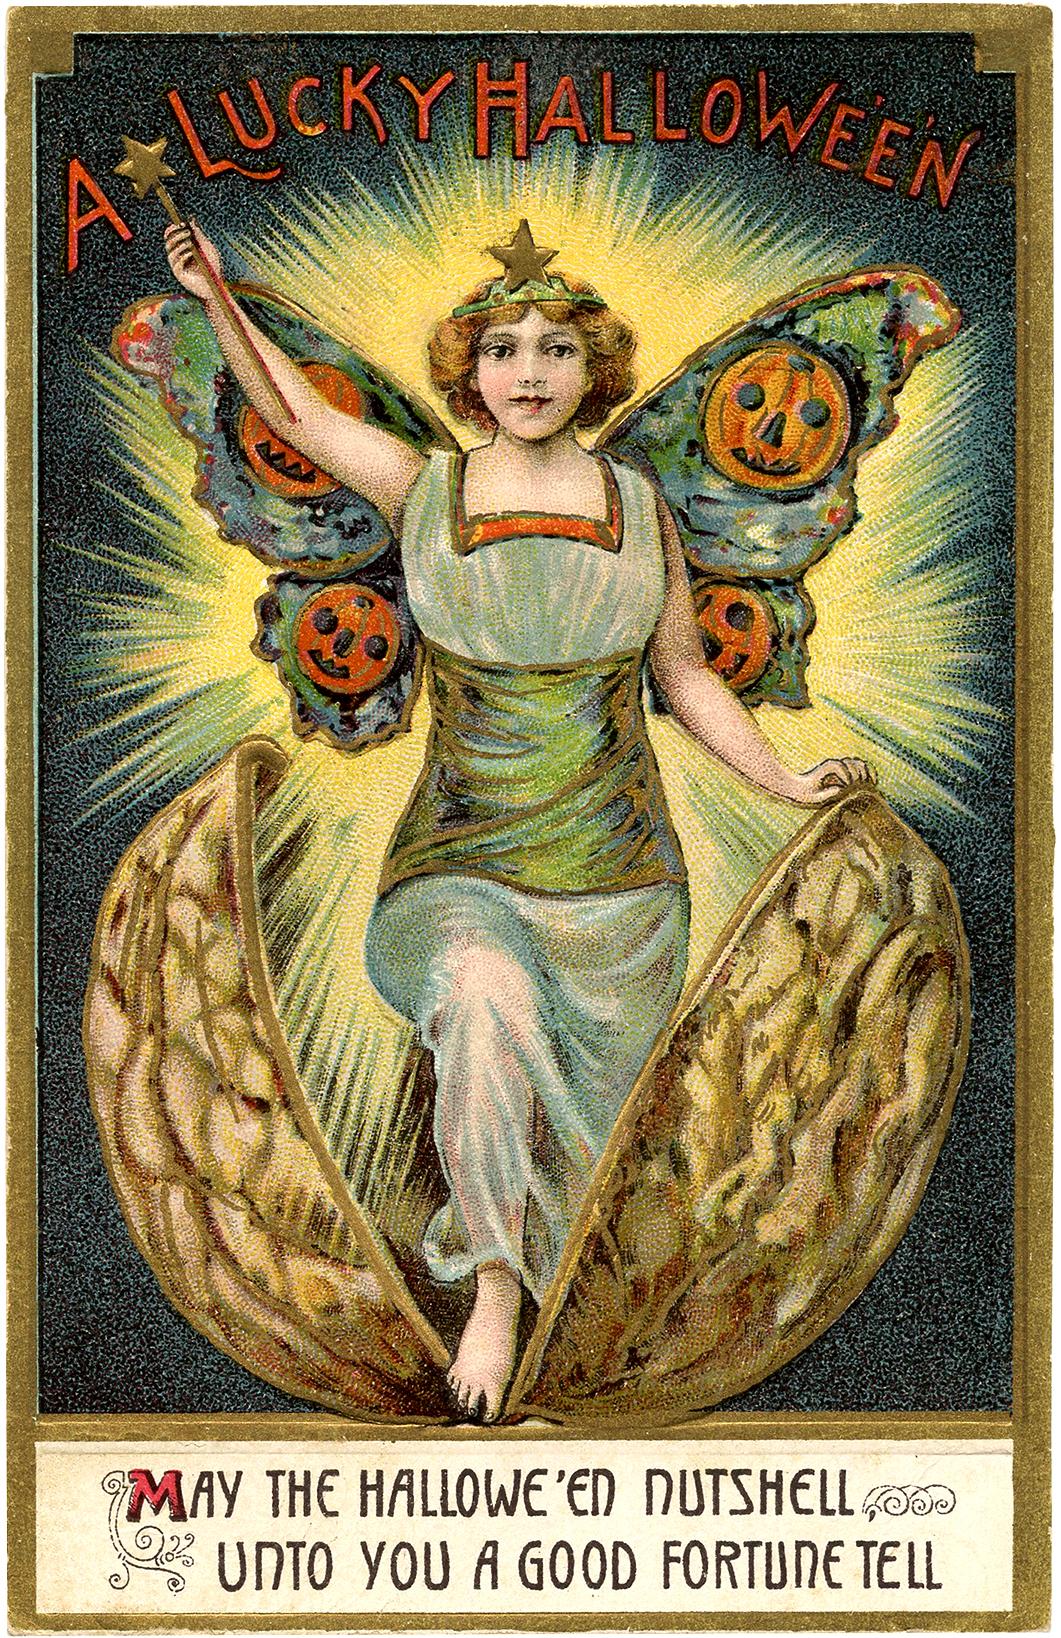 Amazing Vintage Halloween Fairy Image! - The Graphics Fairy